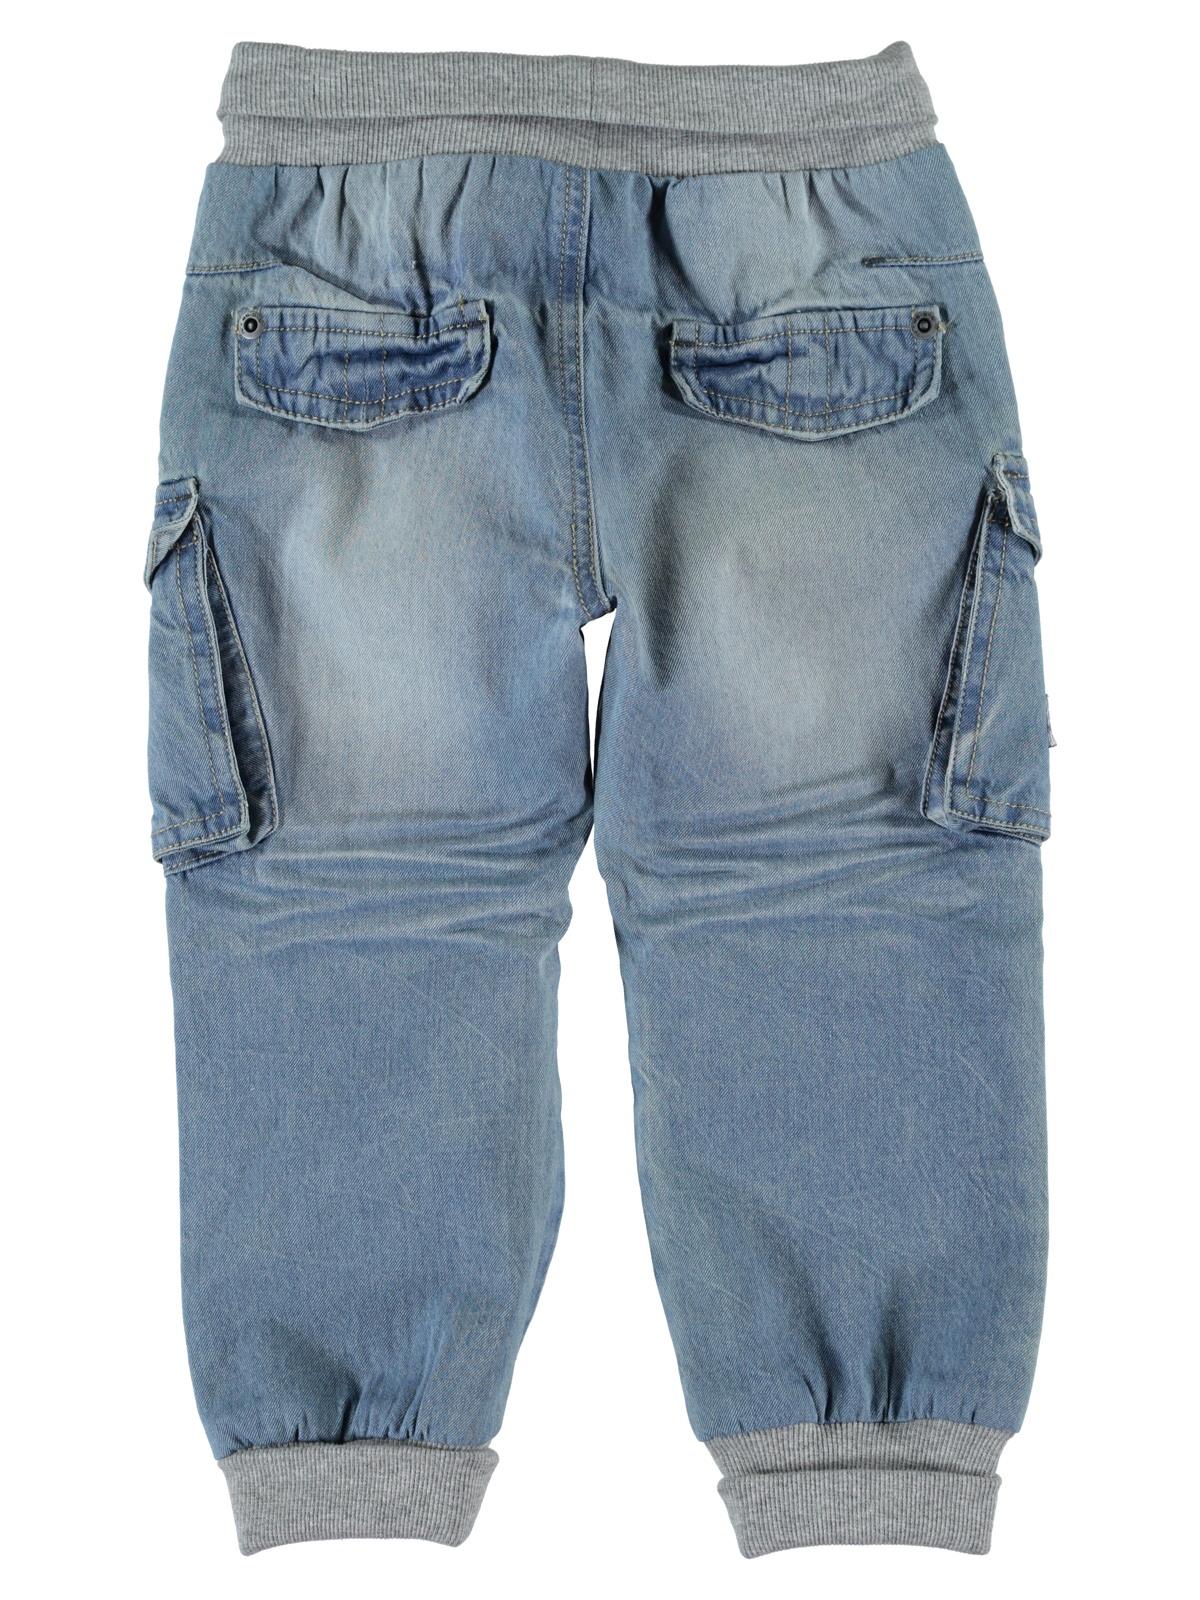 name it jungen jeans hose tonas bag xr dnm baggy pant. Black Bedroom Furniture Sets. Home Design Ideas